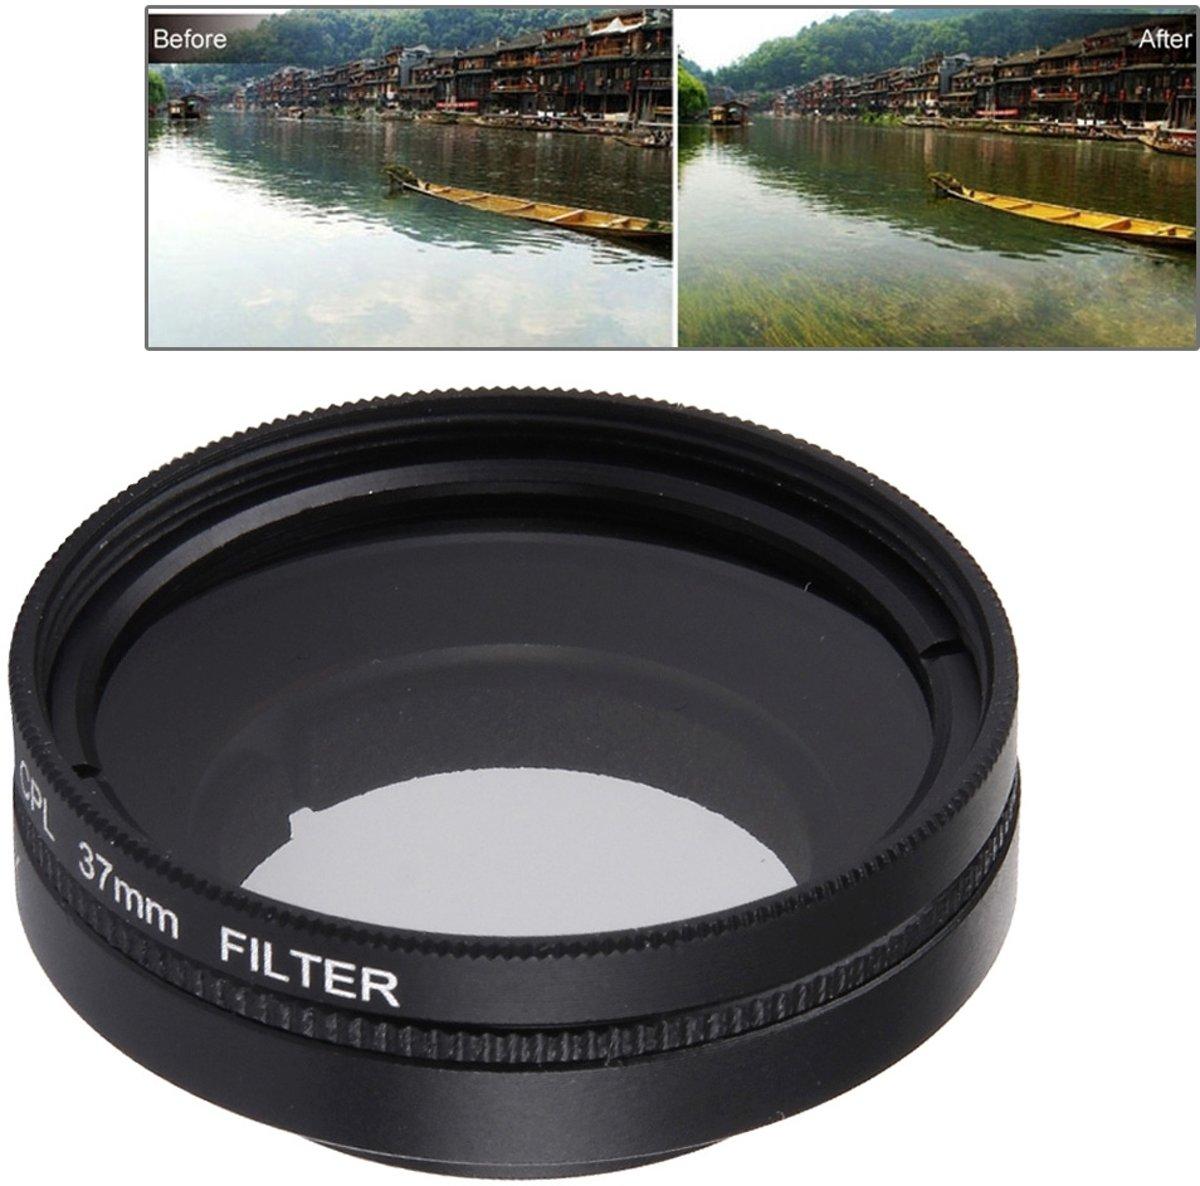 JUNESTAR voor Xiaoyi Xiaoyi Yi II 4K Sport actiecamera Proffesional 37mm CPL filter + lensbeschermkap kopen